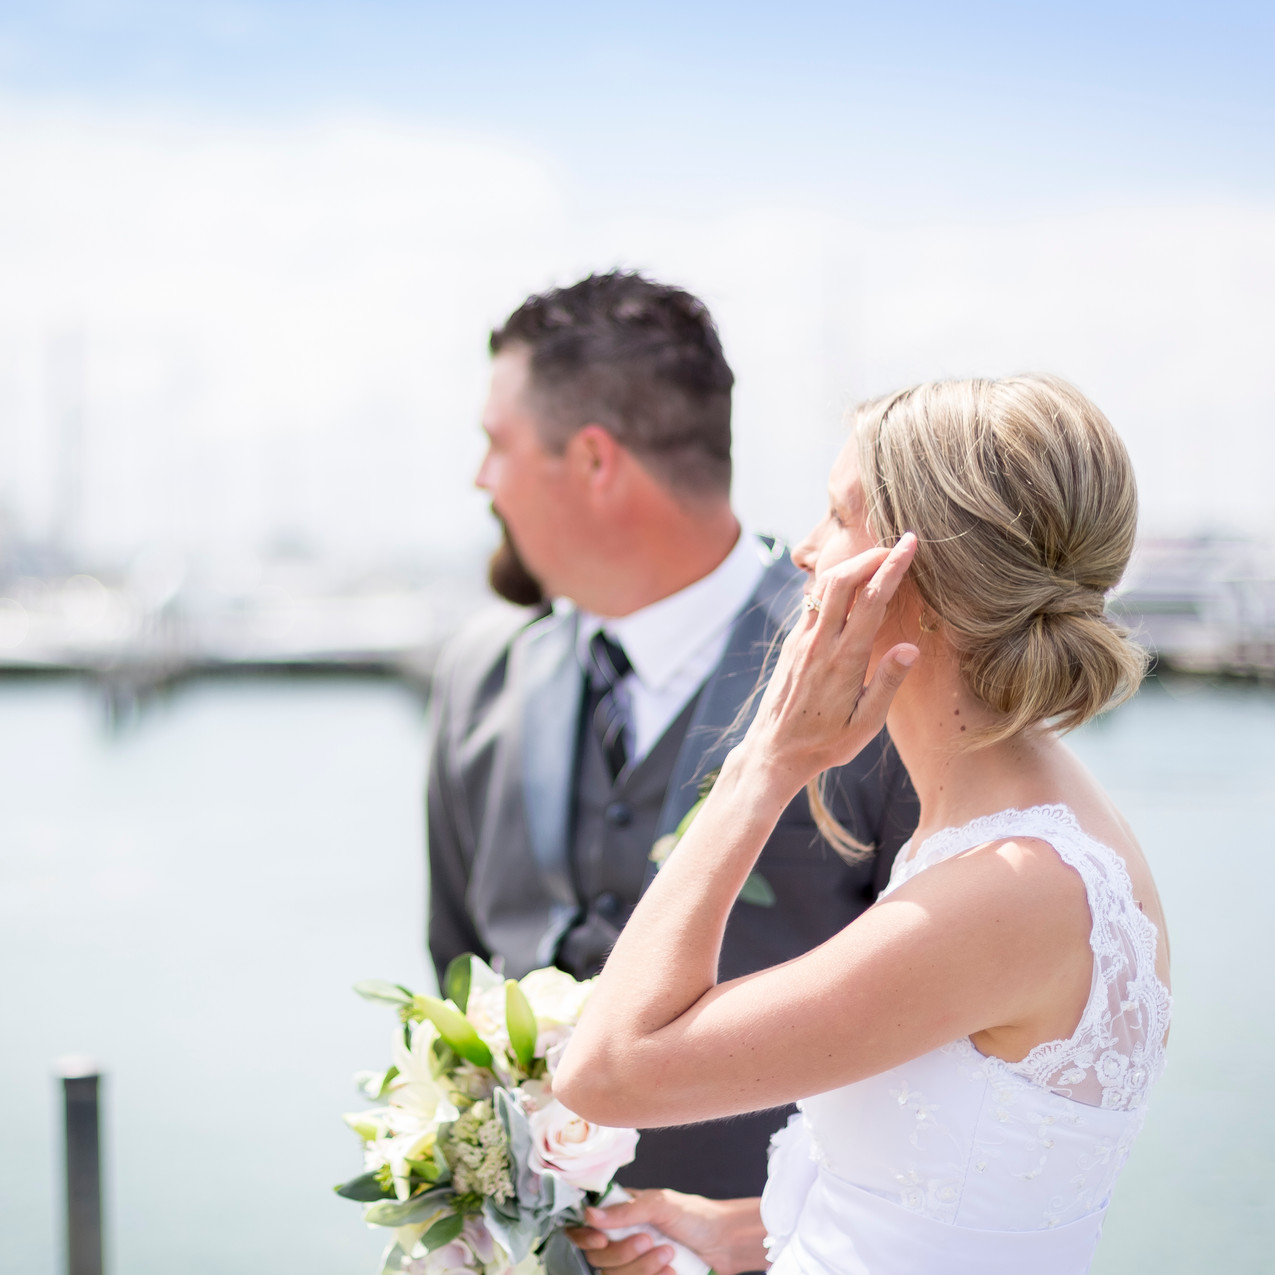 Newlyweds on Port Philip Bay